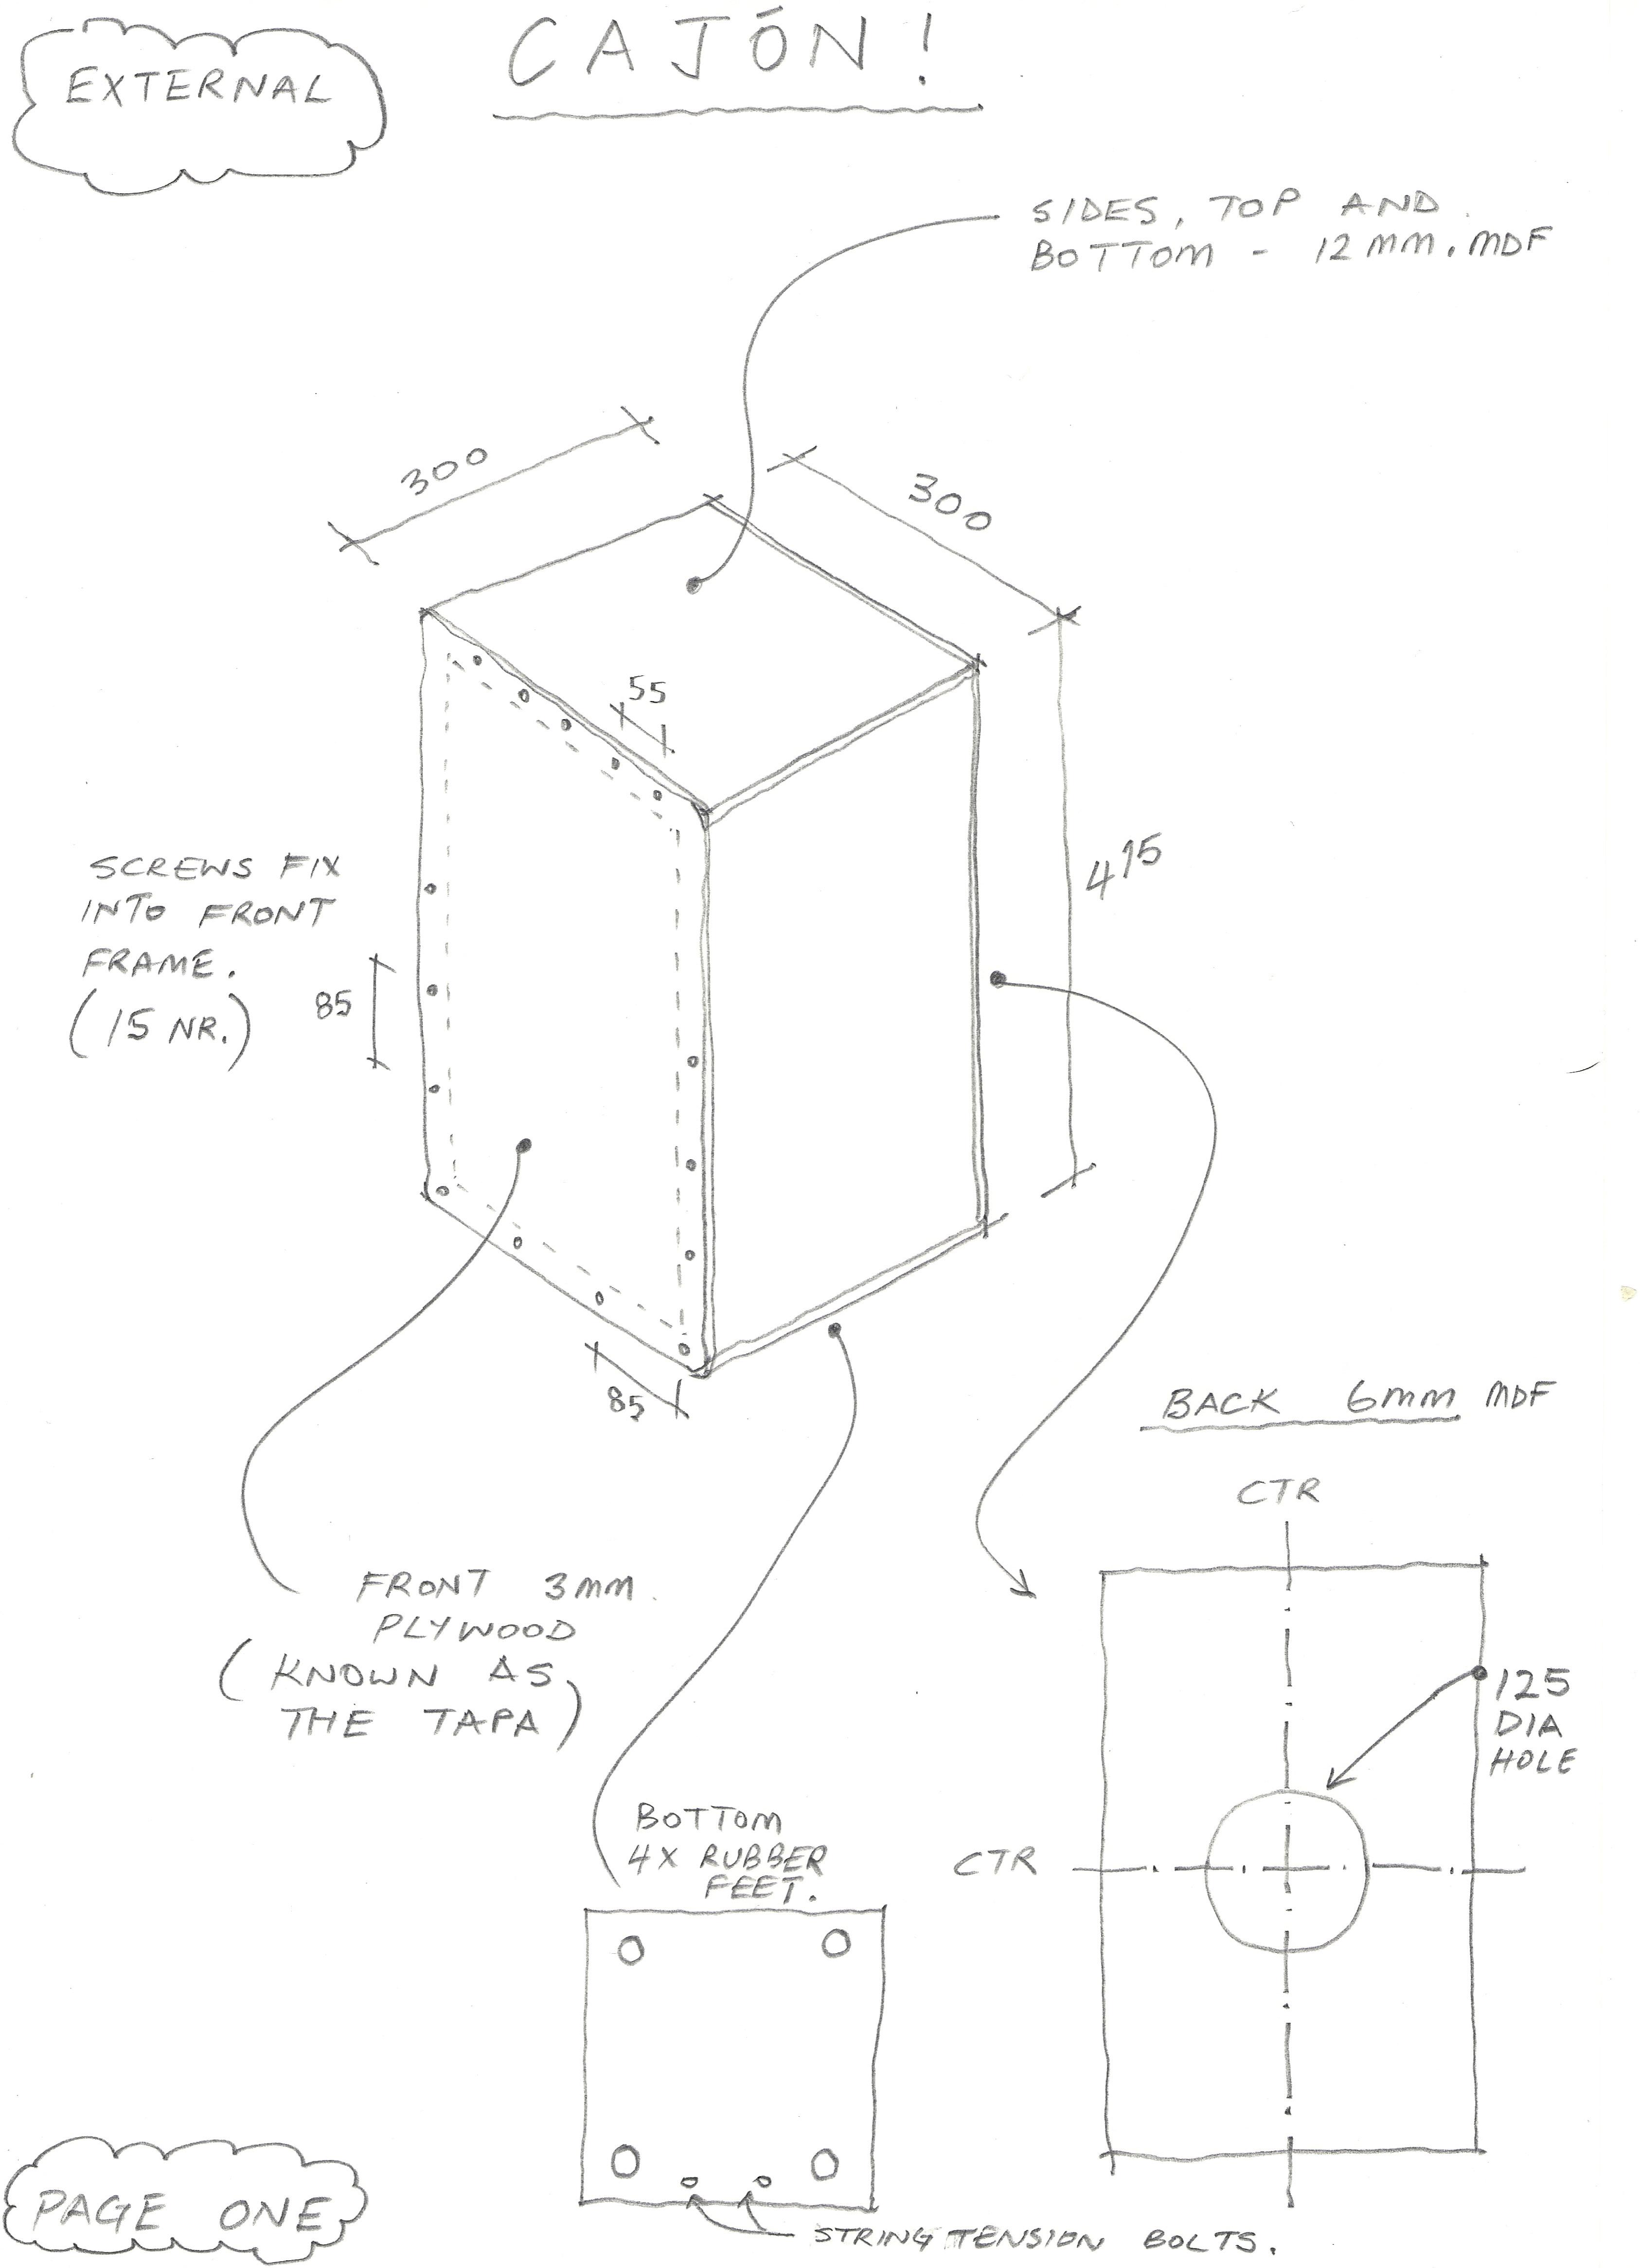 How To Make A Cajon